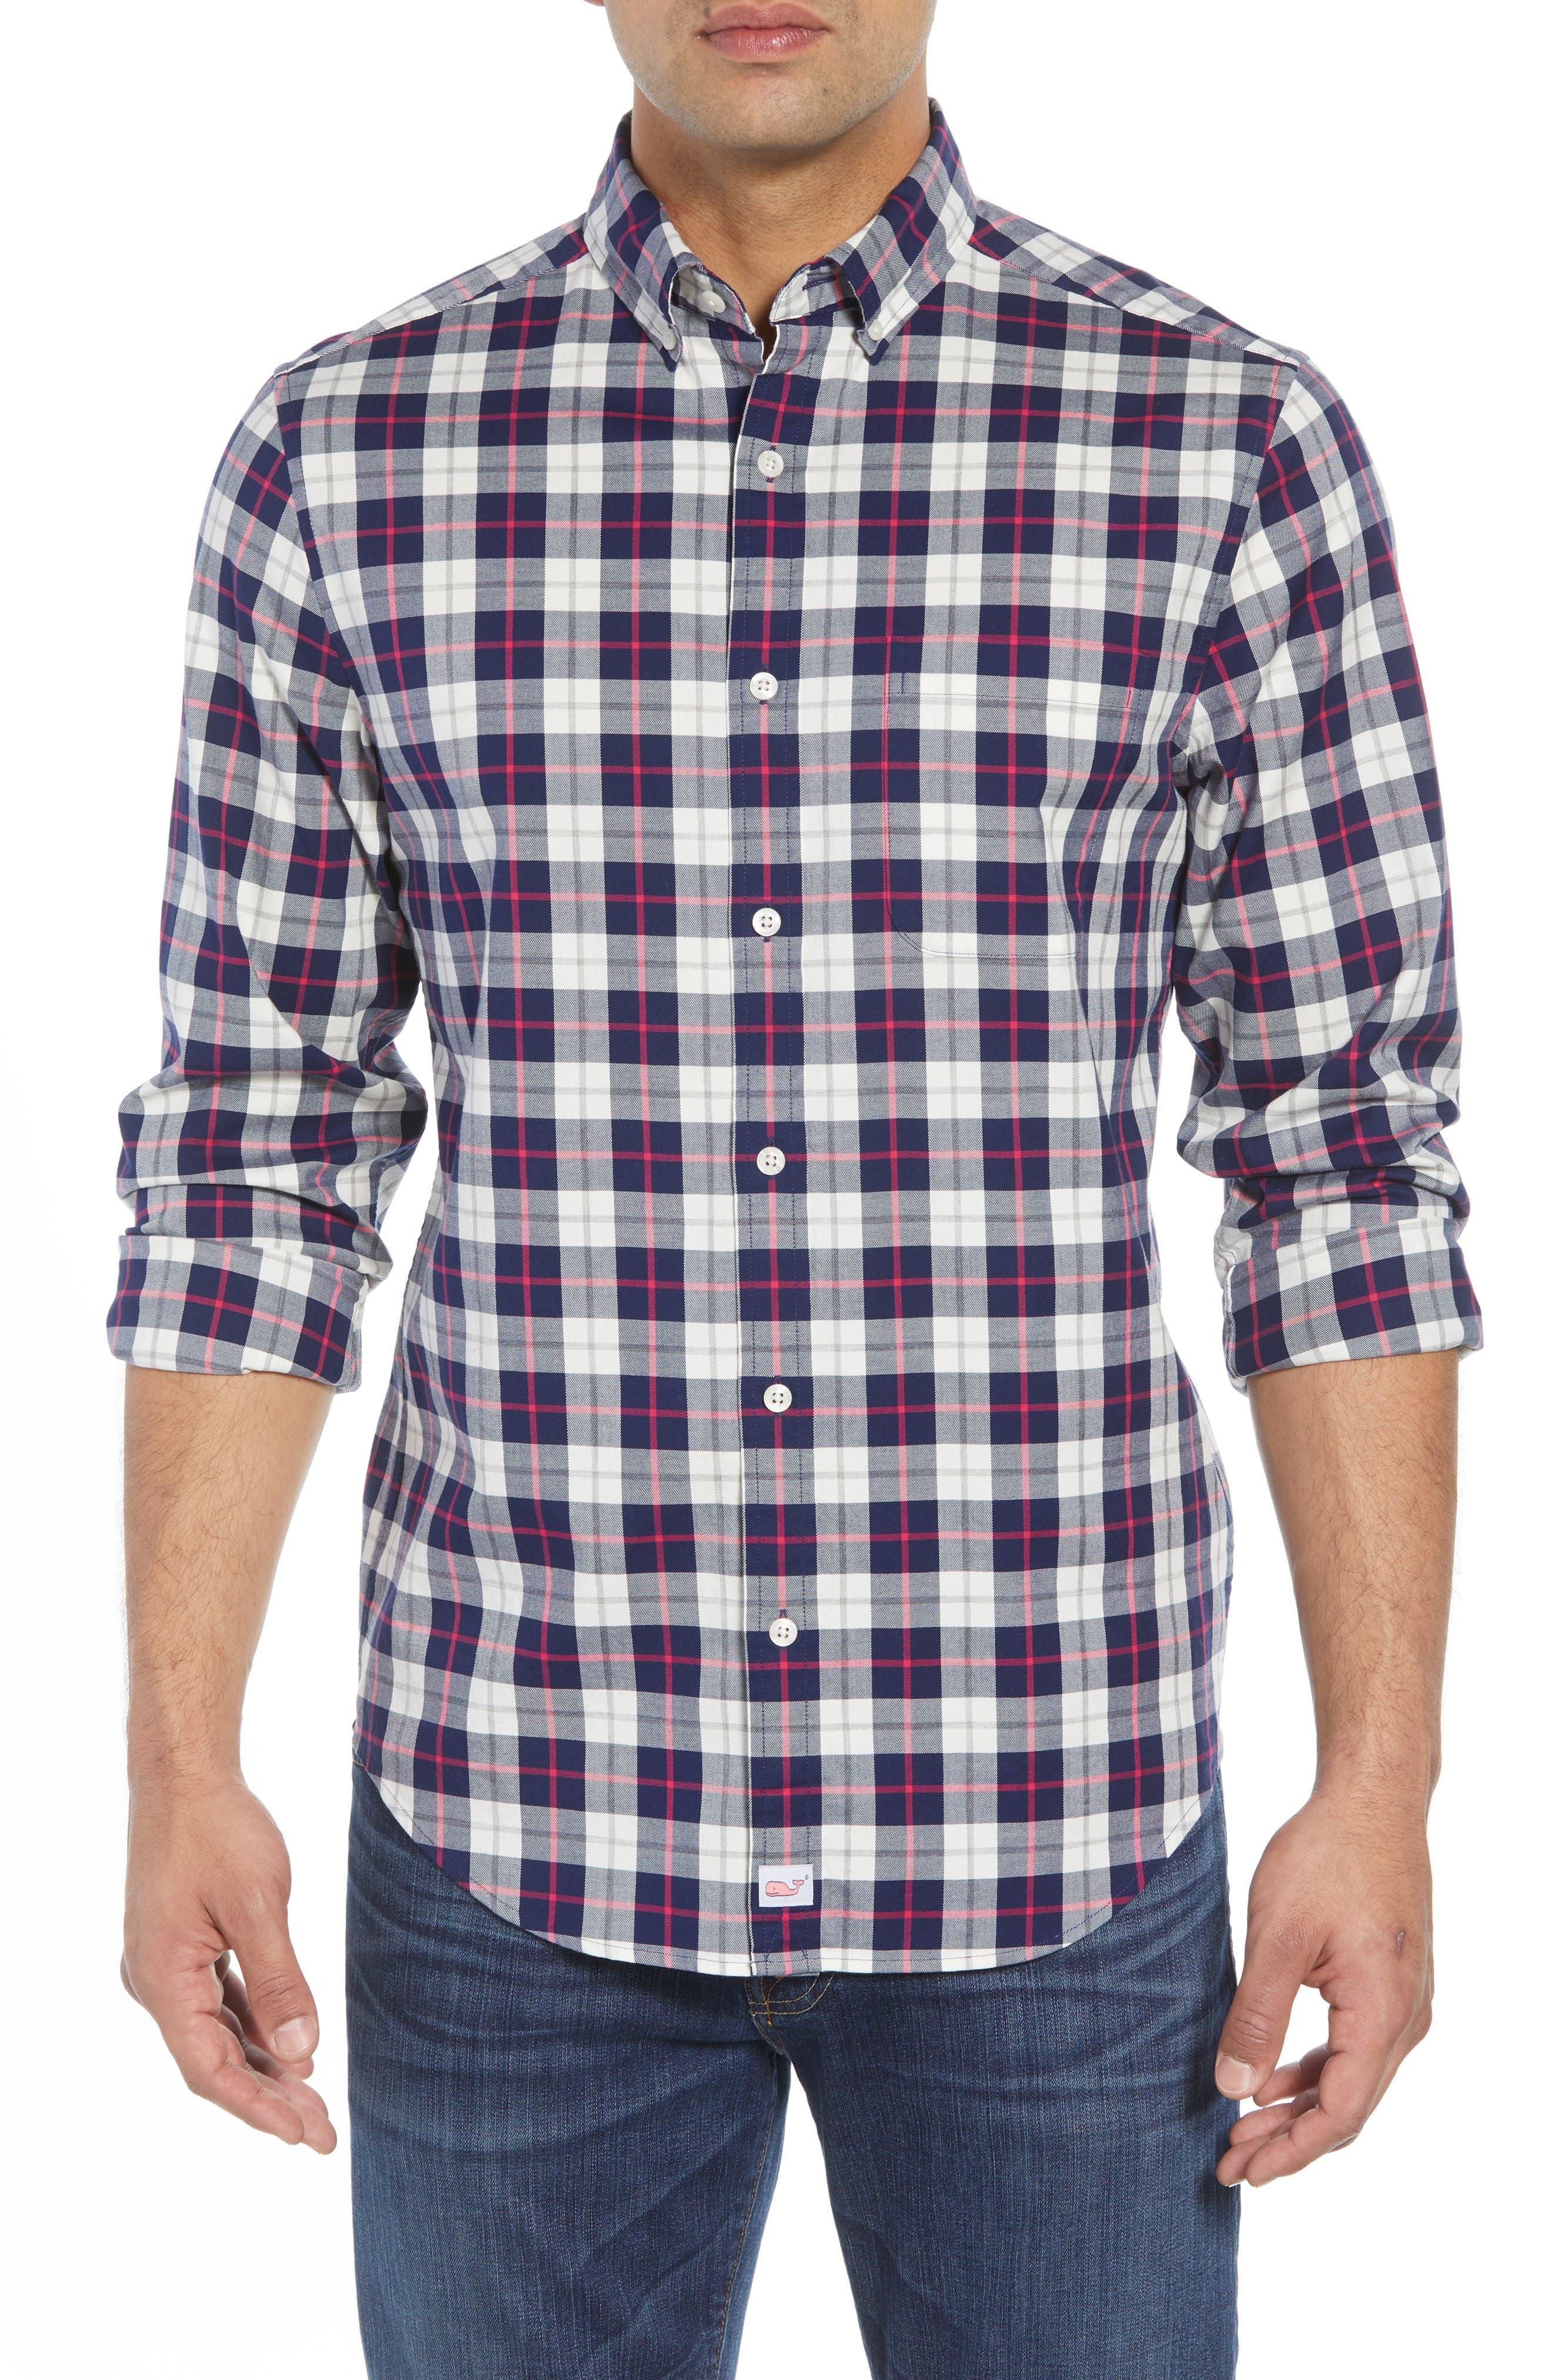 Riverbank Regular Fit Plaid Sport Shirt,                             Main thumbnail 1, color,                             KATAMA BAY